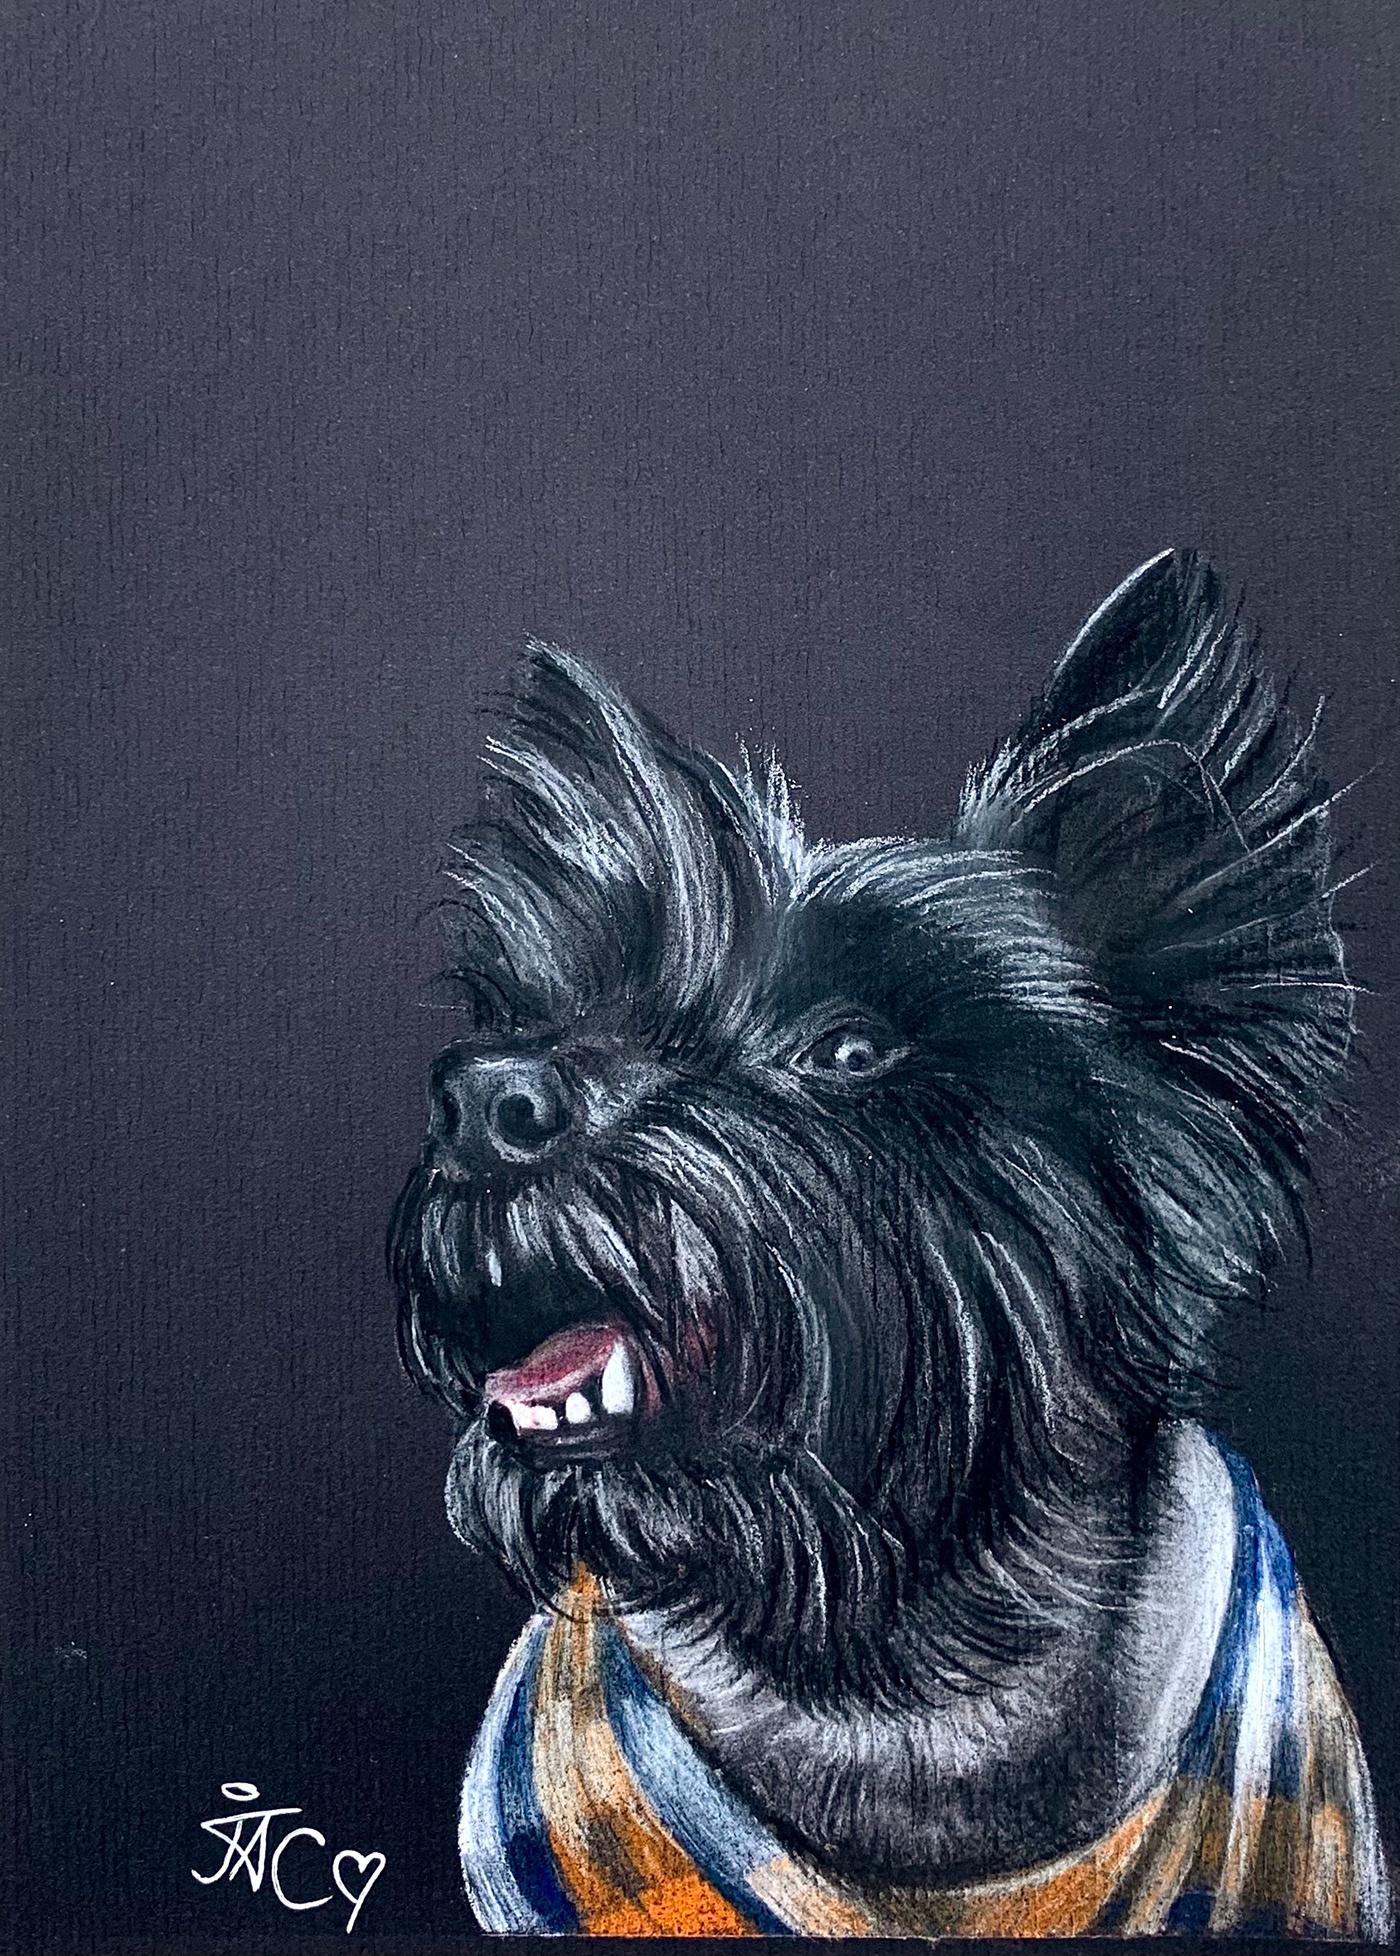 Cat dog family hand drawn Hand Painted horse paint Painted pastel pencil Pet pony portrait rabbit